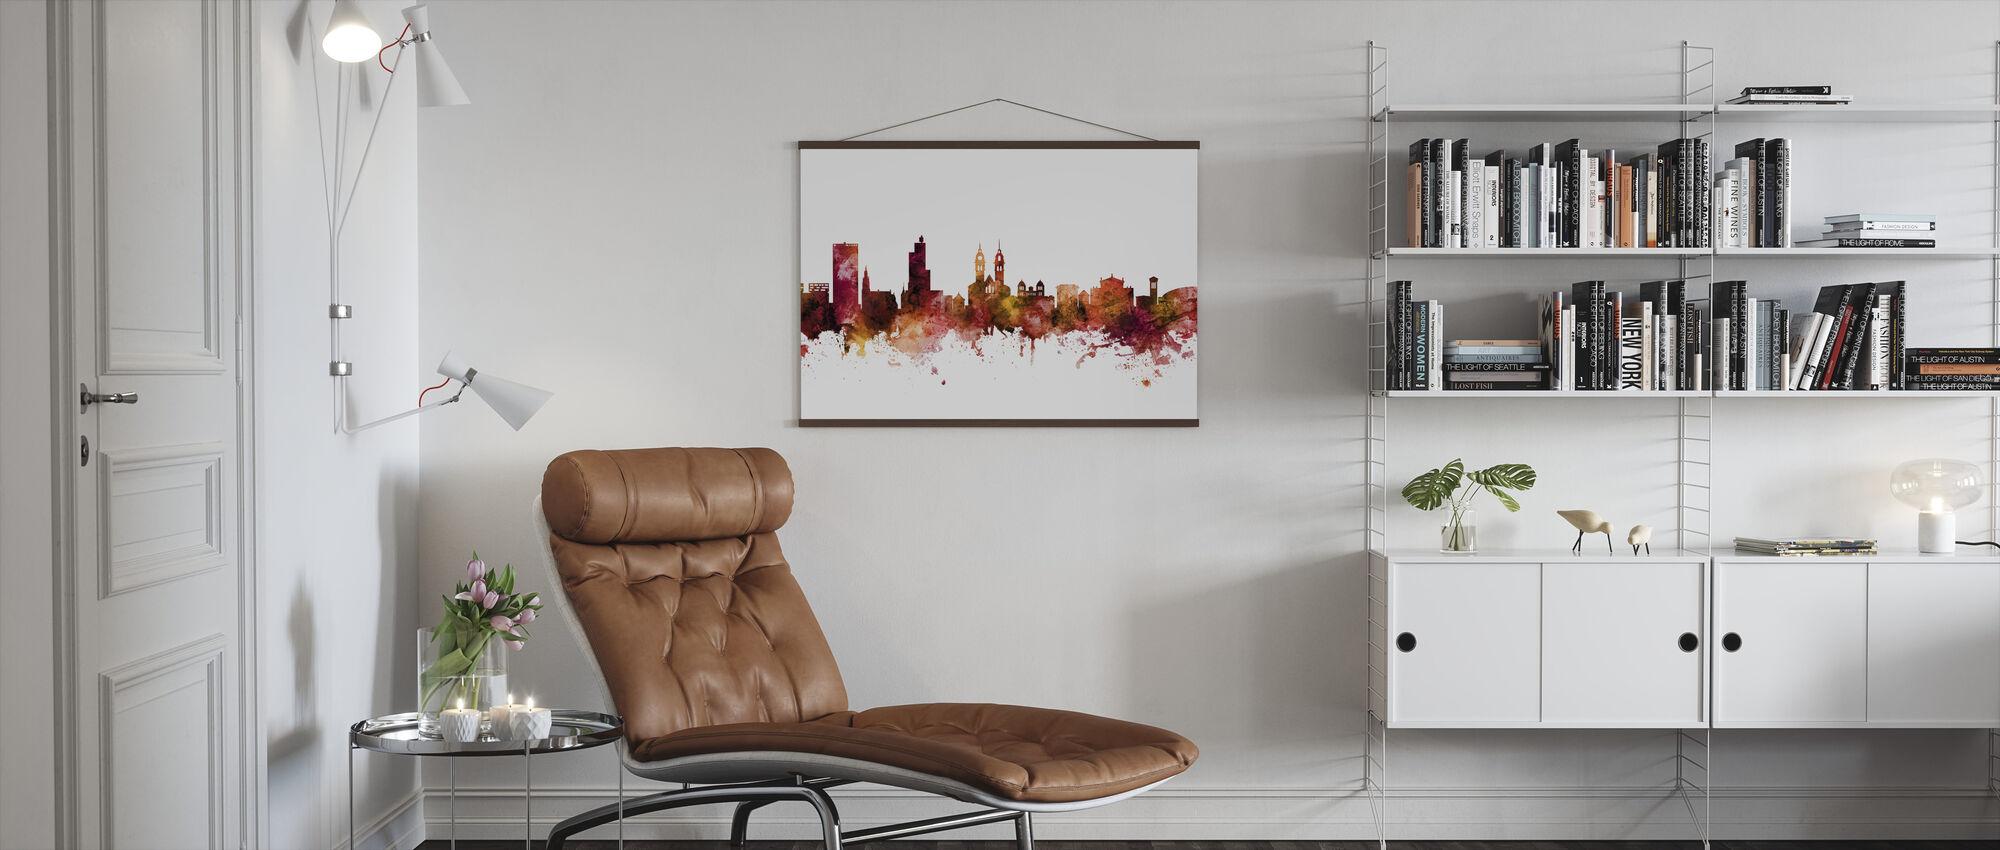 Skyline van Winterthur Zwitserland - Poster - Woonkamer